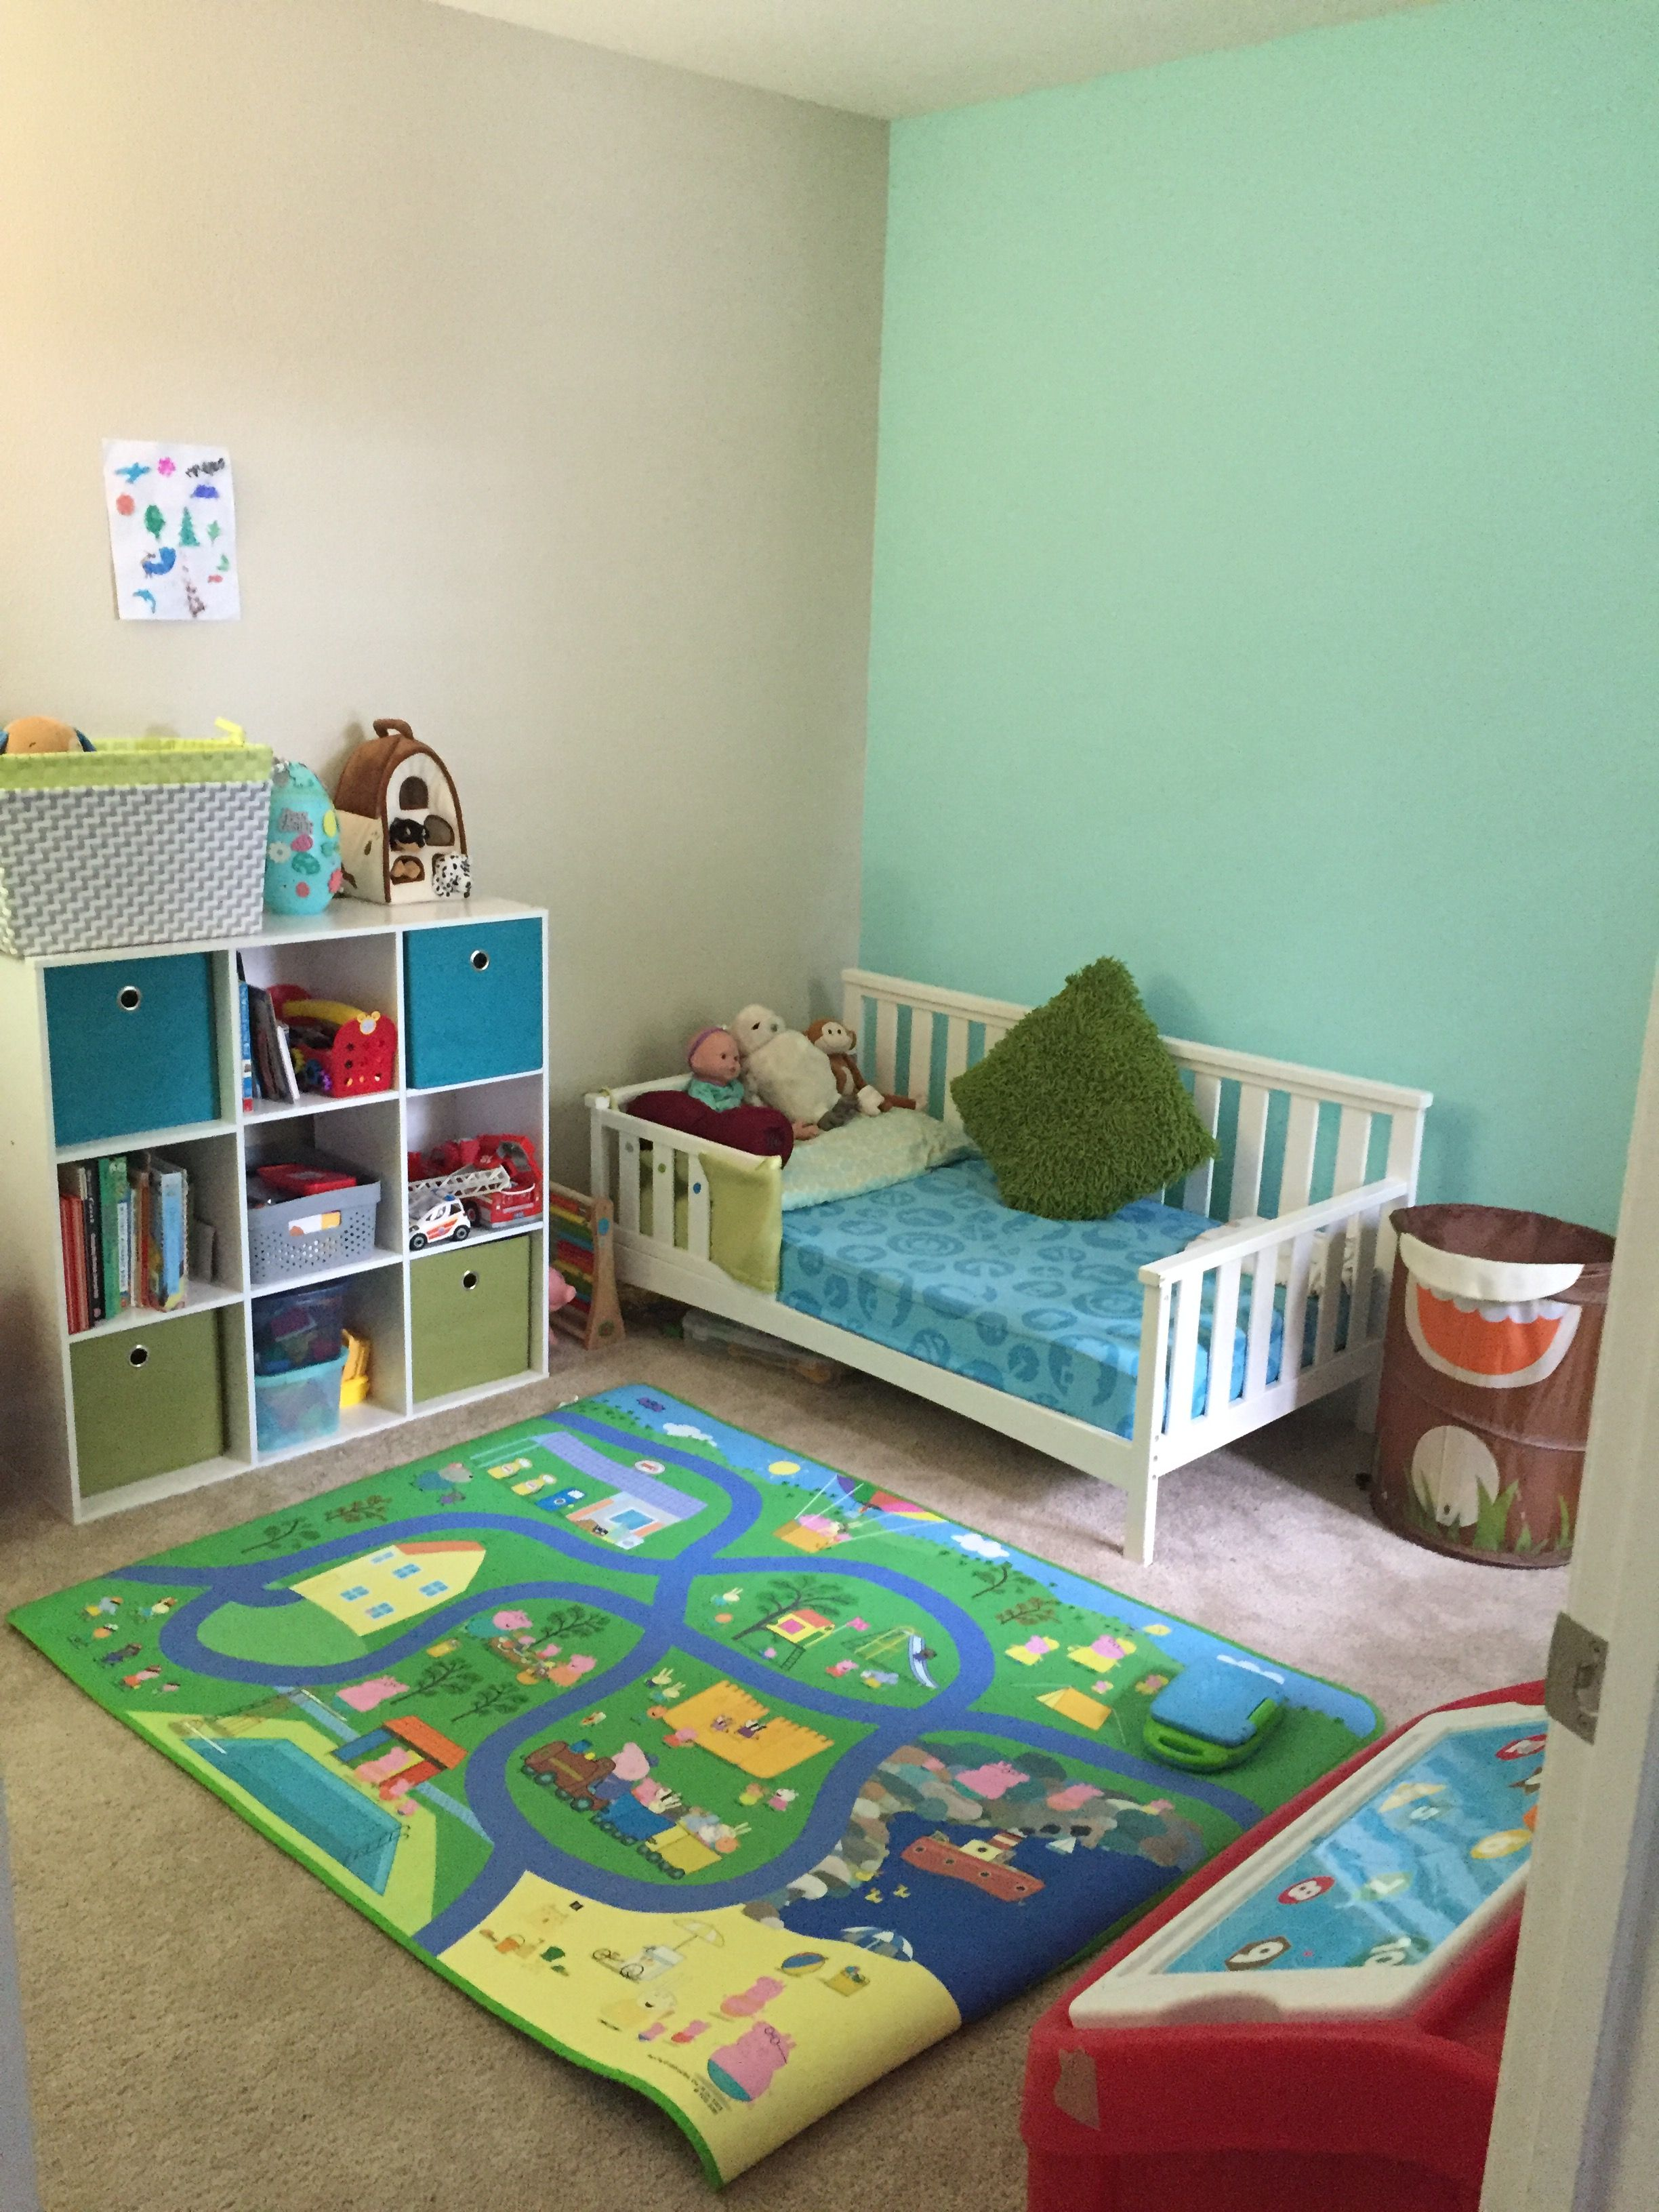 Playroom Ideas, Toddler Boys, Boy Rooms, Playrooms, Toddlers, Infants, Play  Rooms, Game Rooms, Boy Bedrooms